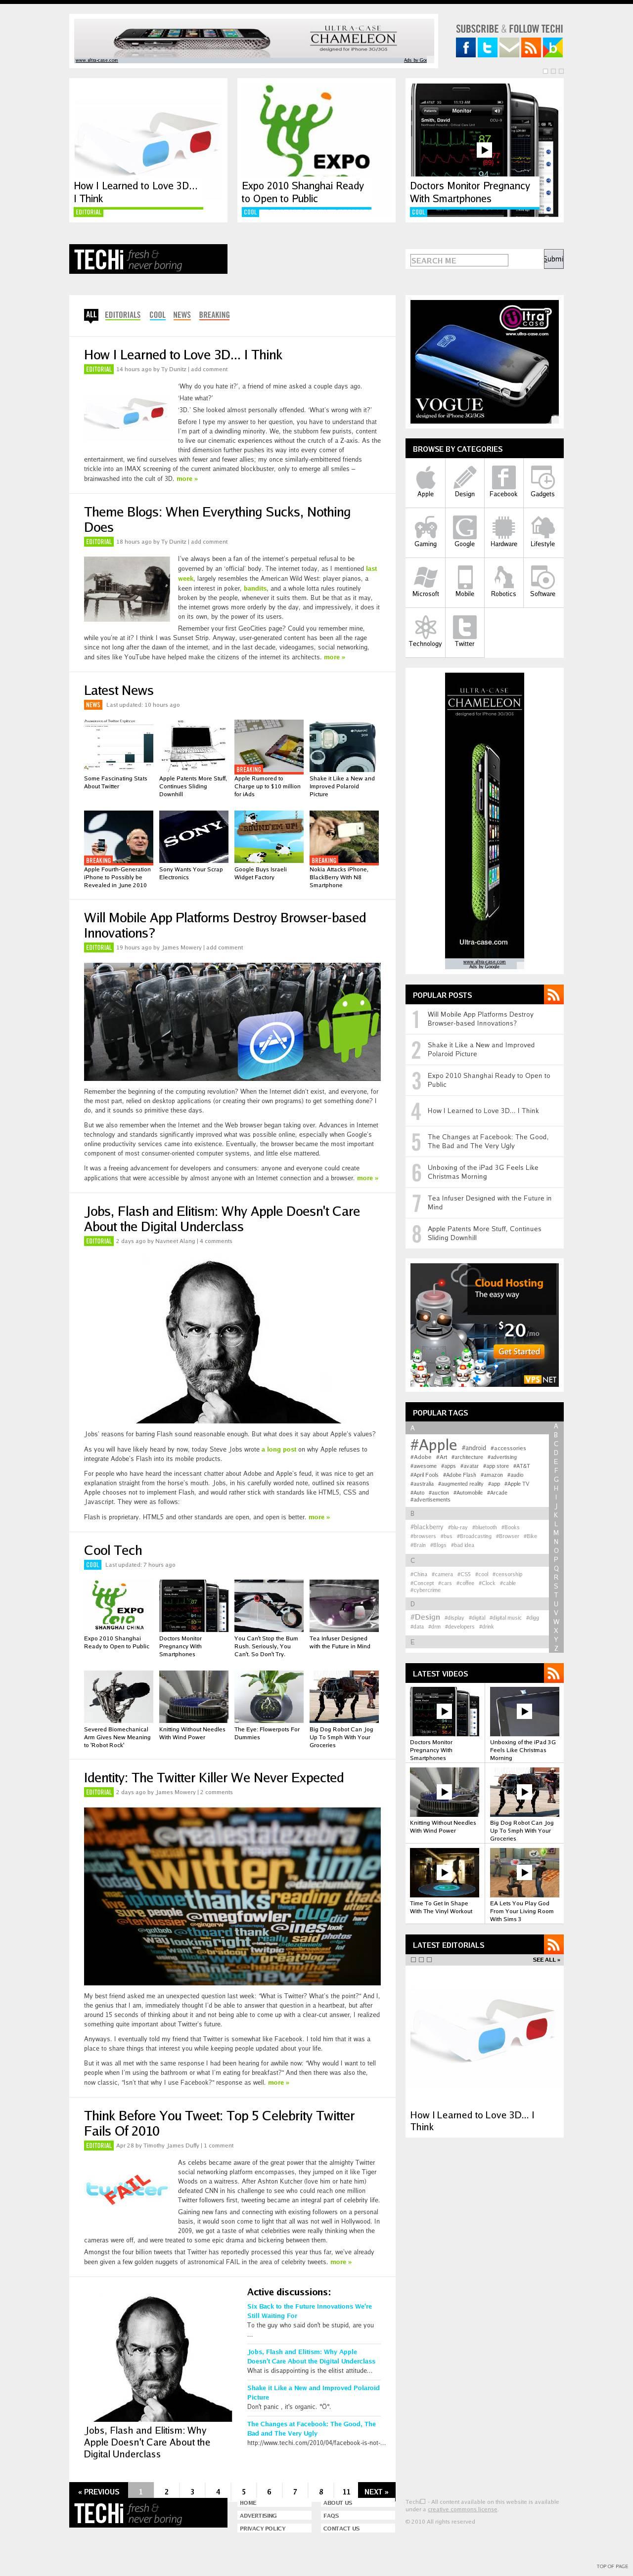 Techi.com - Fresh & Never Boring Tech Updates 1